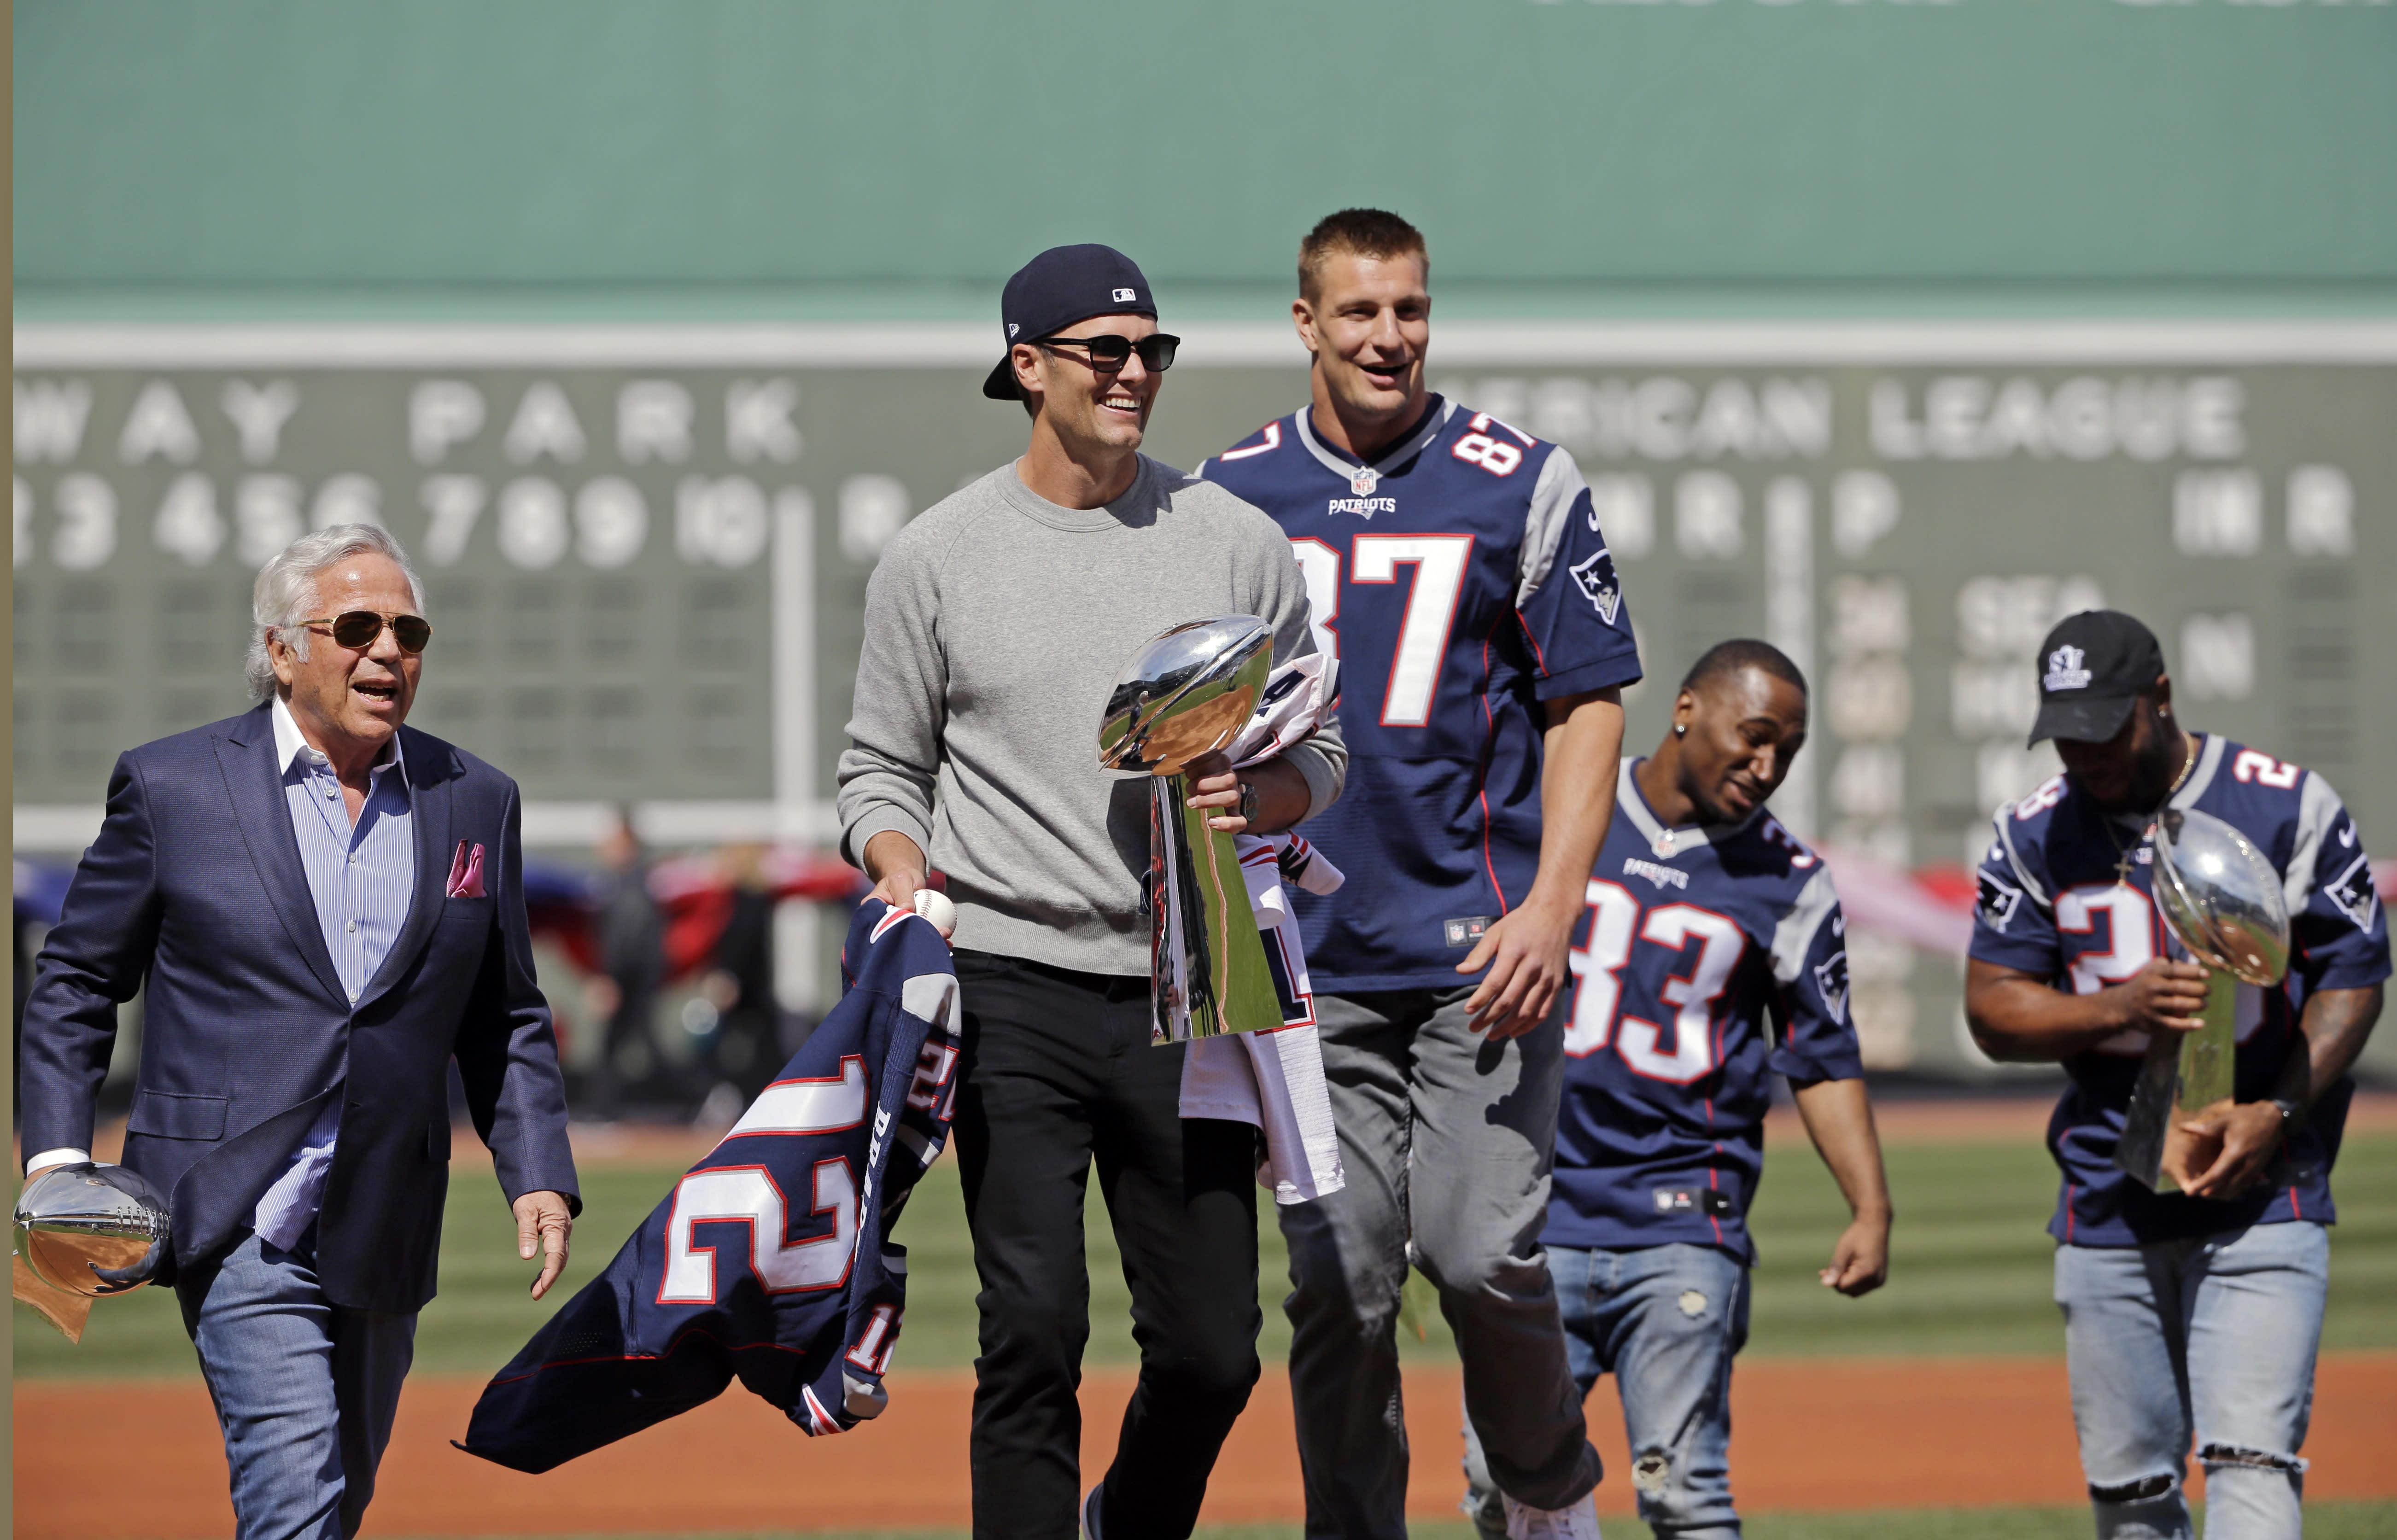 Red Sox' Hanley Ramirez credits Tom Brady's book with improved fitness